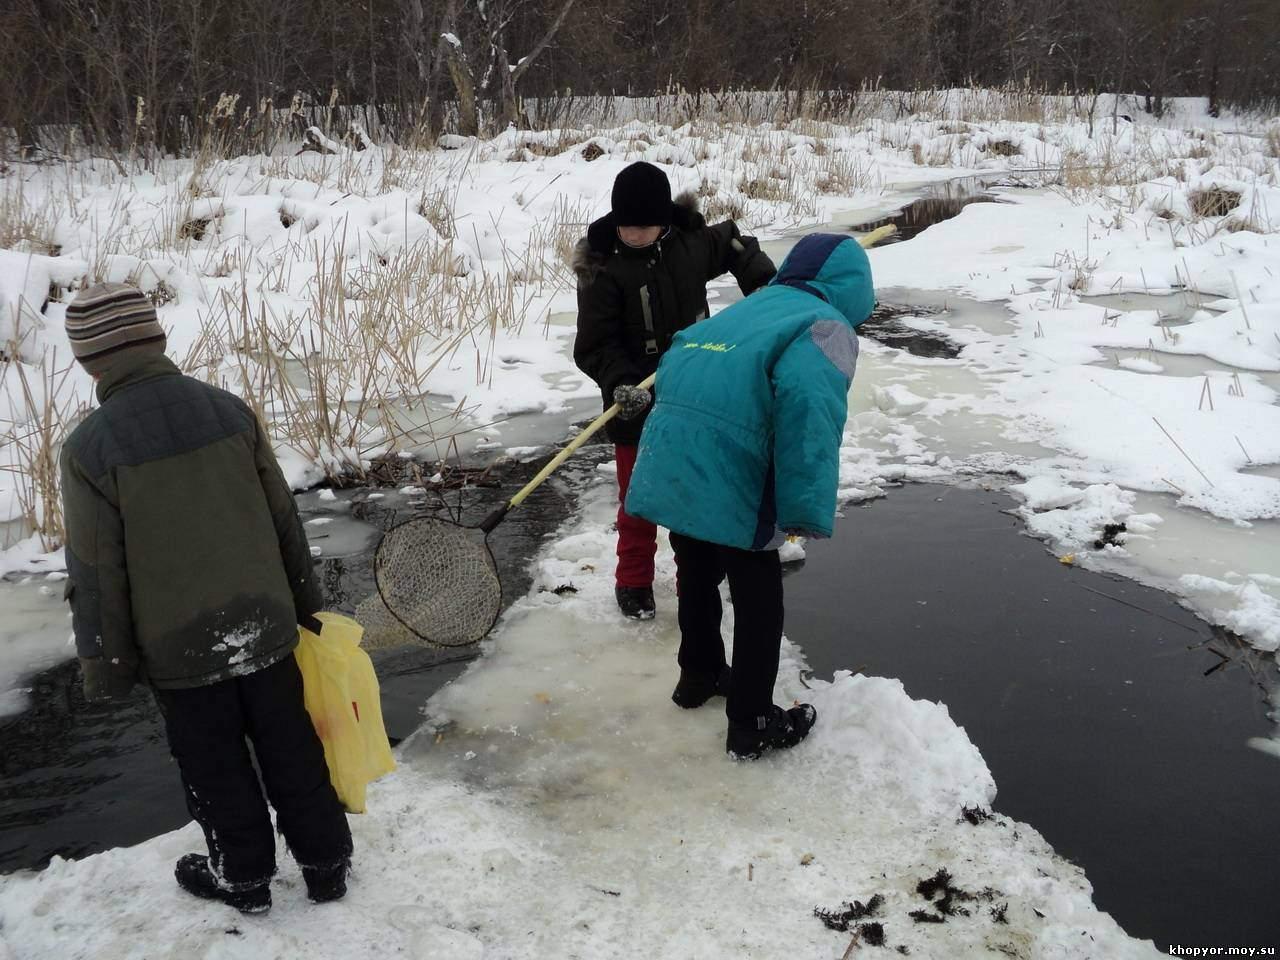 ловить рыбу в проруби